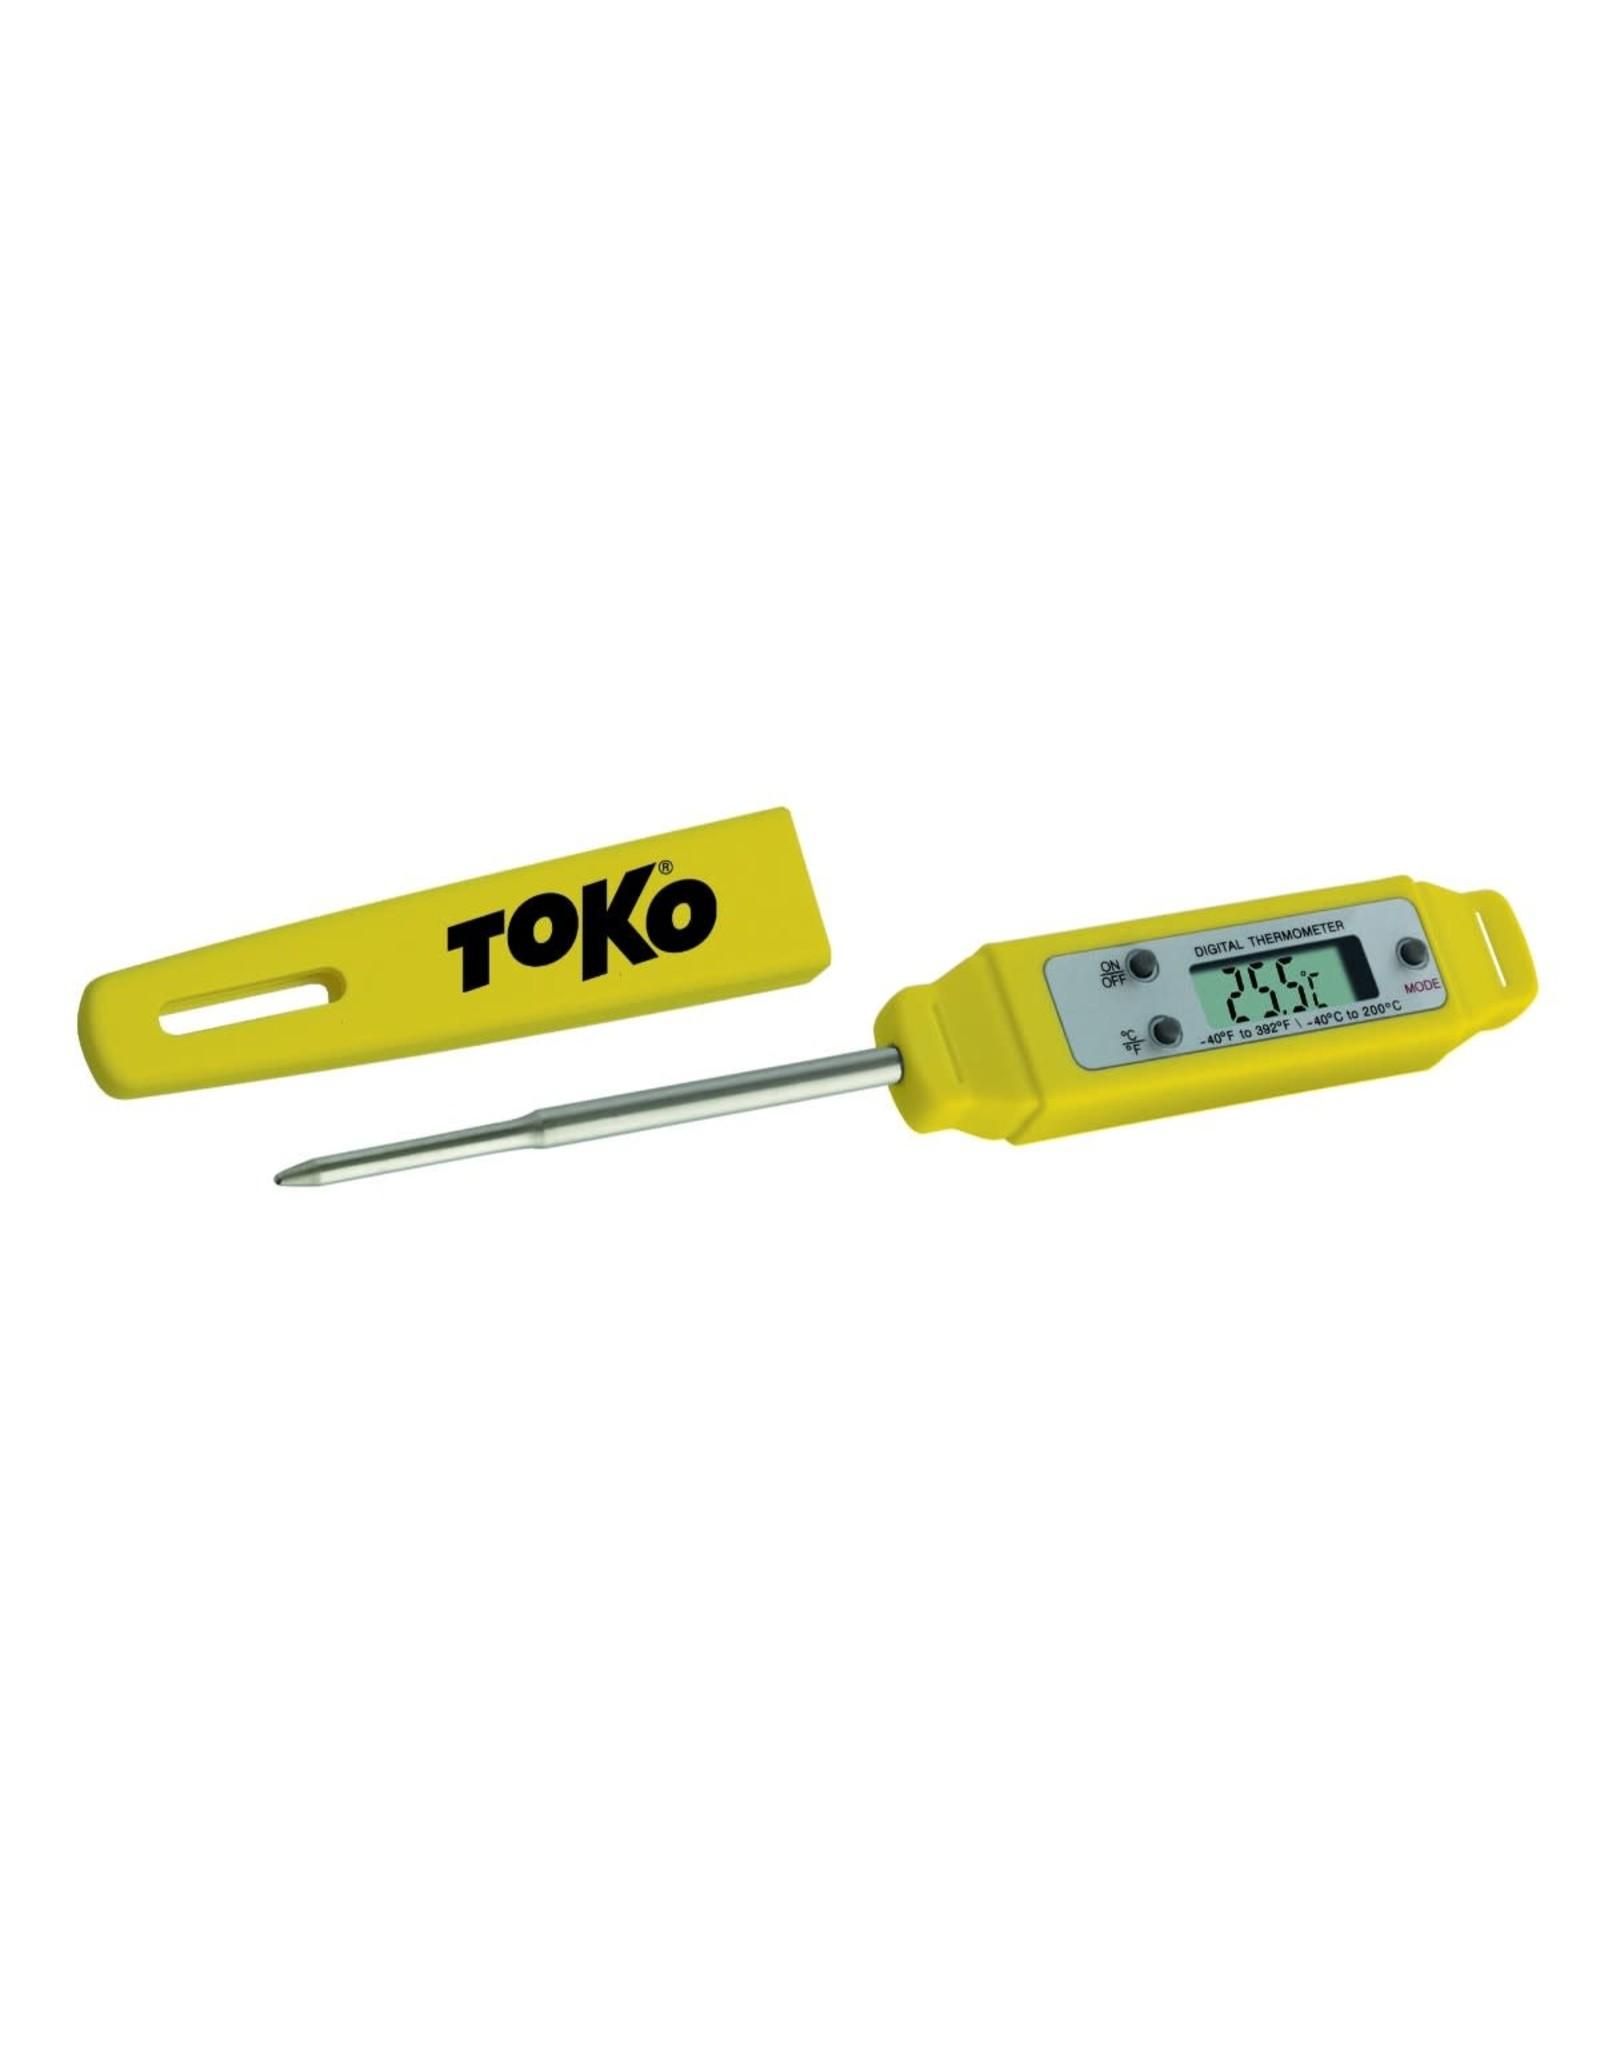 Toko Toko Digital Snowthermometer